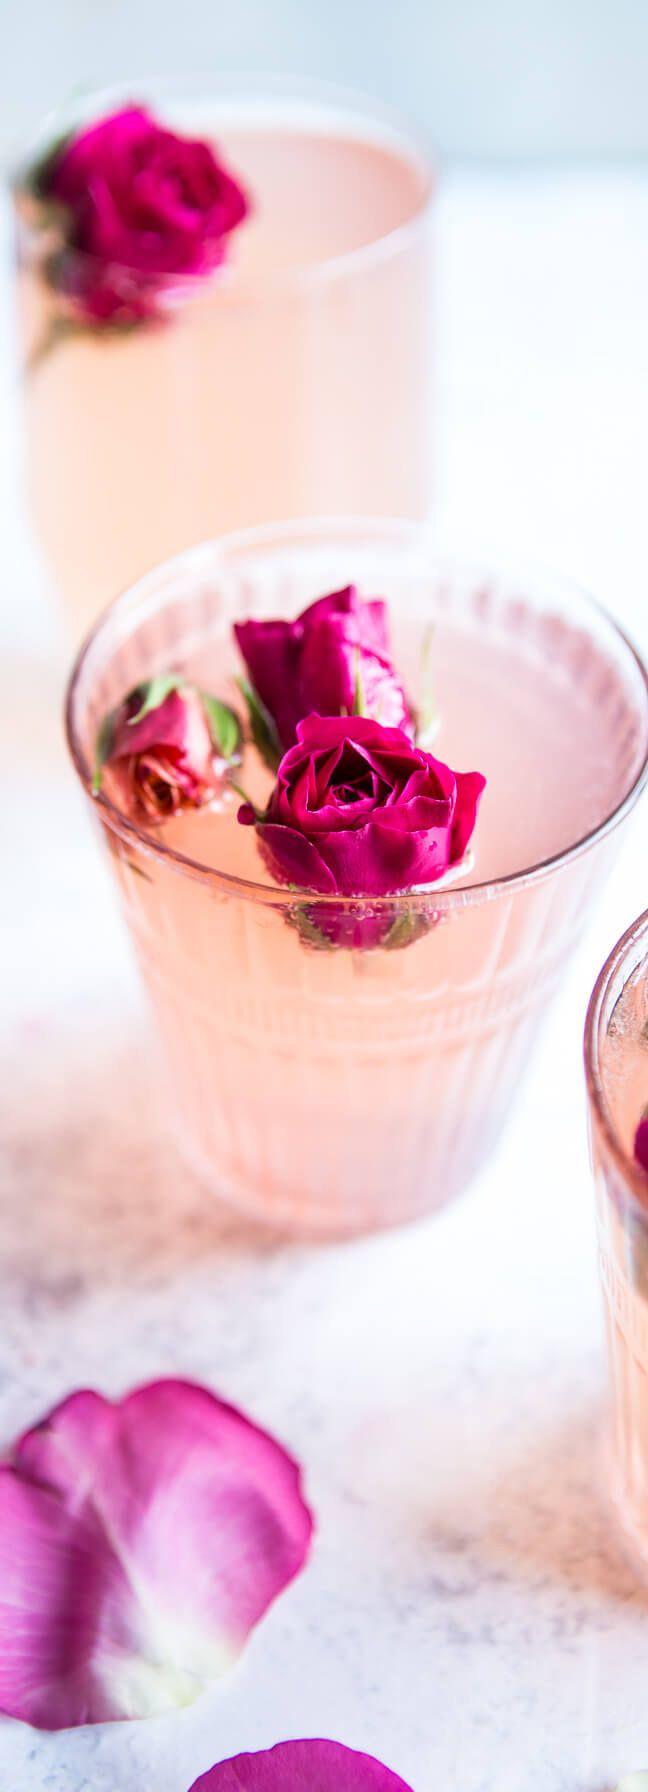 2571 best DRINKS & ICE CREAM .. images on Pinterest   Drinks ...